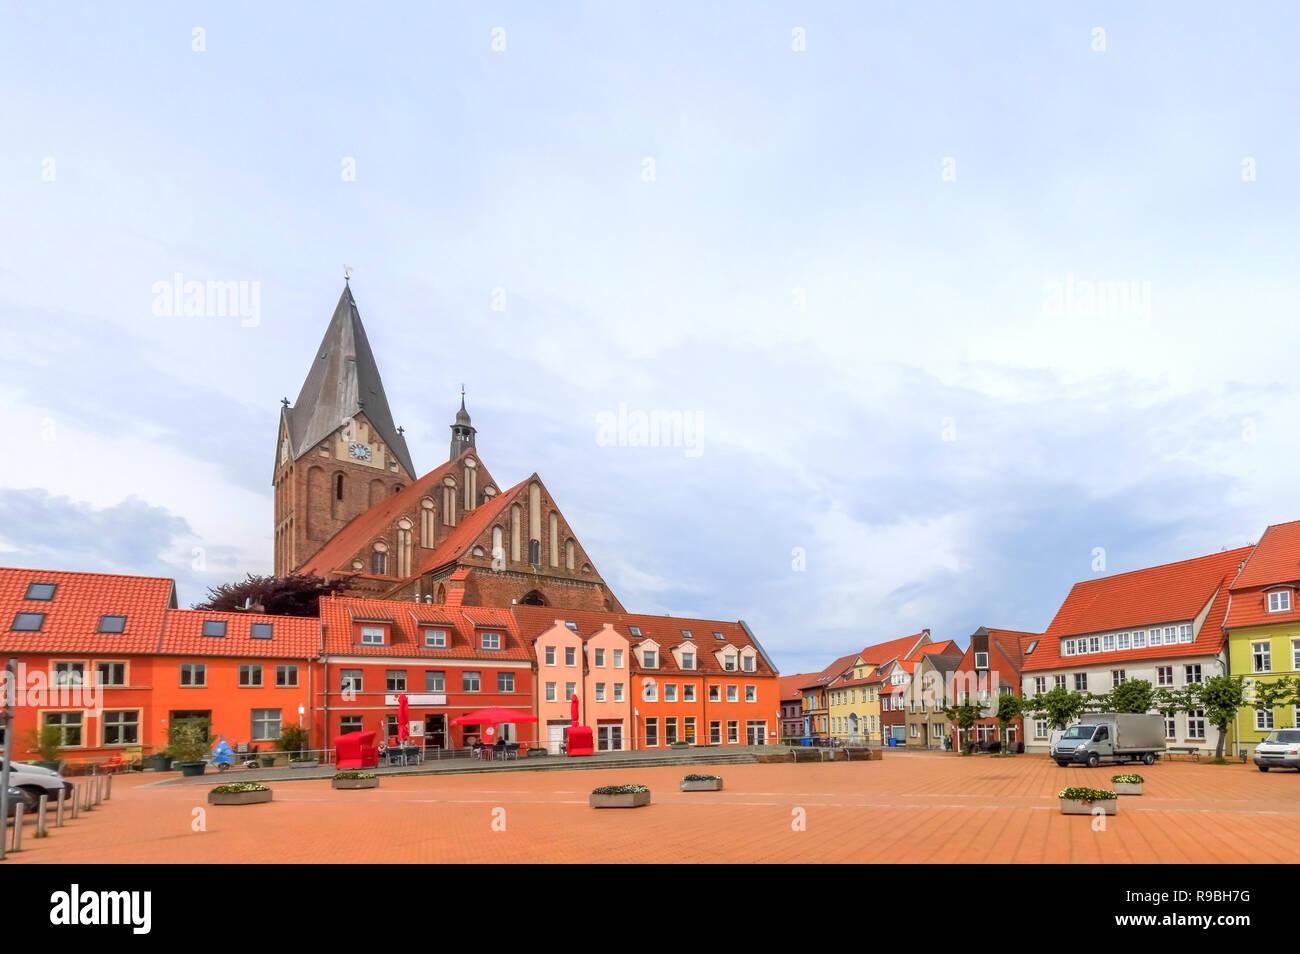 Barth, Island Ruegen, Germany - Stock Image